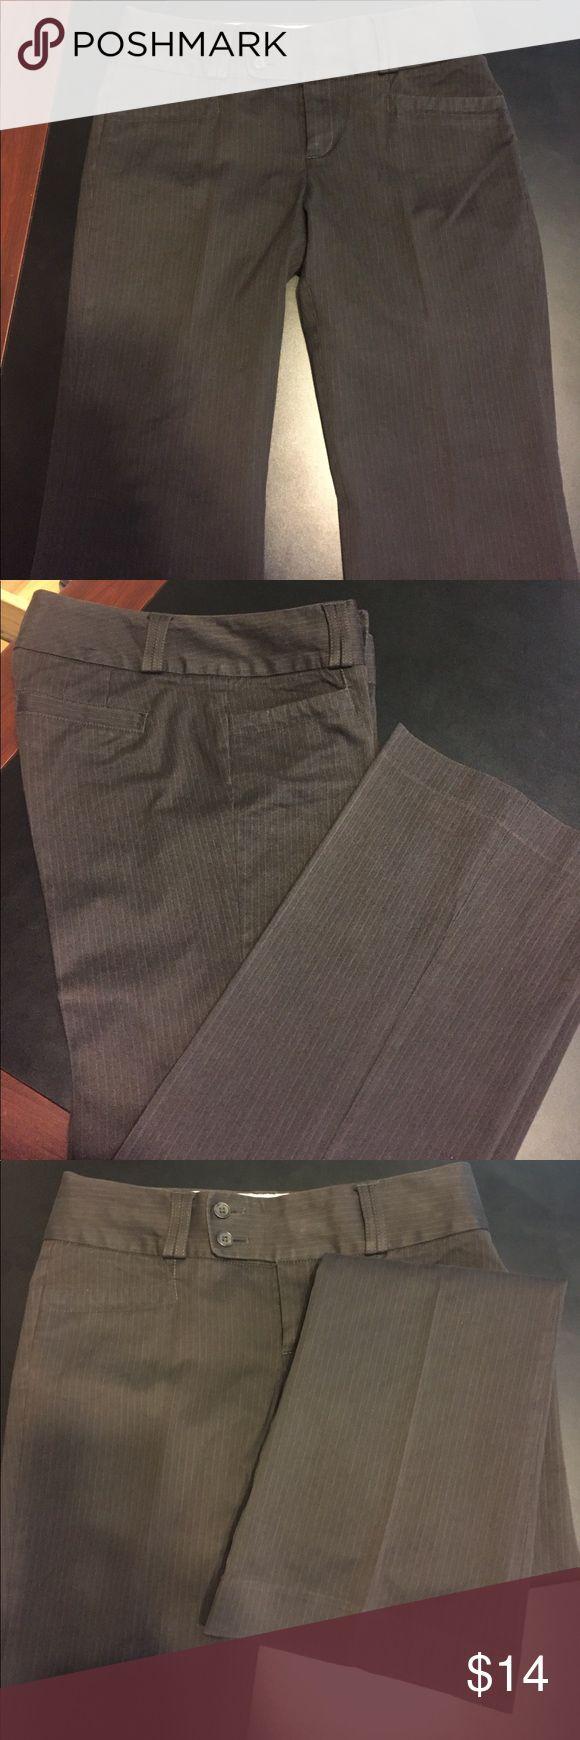 "Ladies Size 4S  pinstripe Banana Republic trousers Size 4S Chocolate  brown pinstripe Banana Republic trousers Measurements waist 30"" length 38"" Inseam 29.5"" Rise 8"" Banana Republic Pants Trousers"